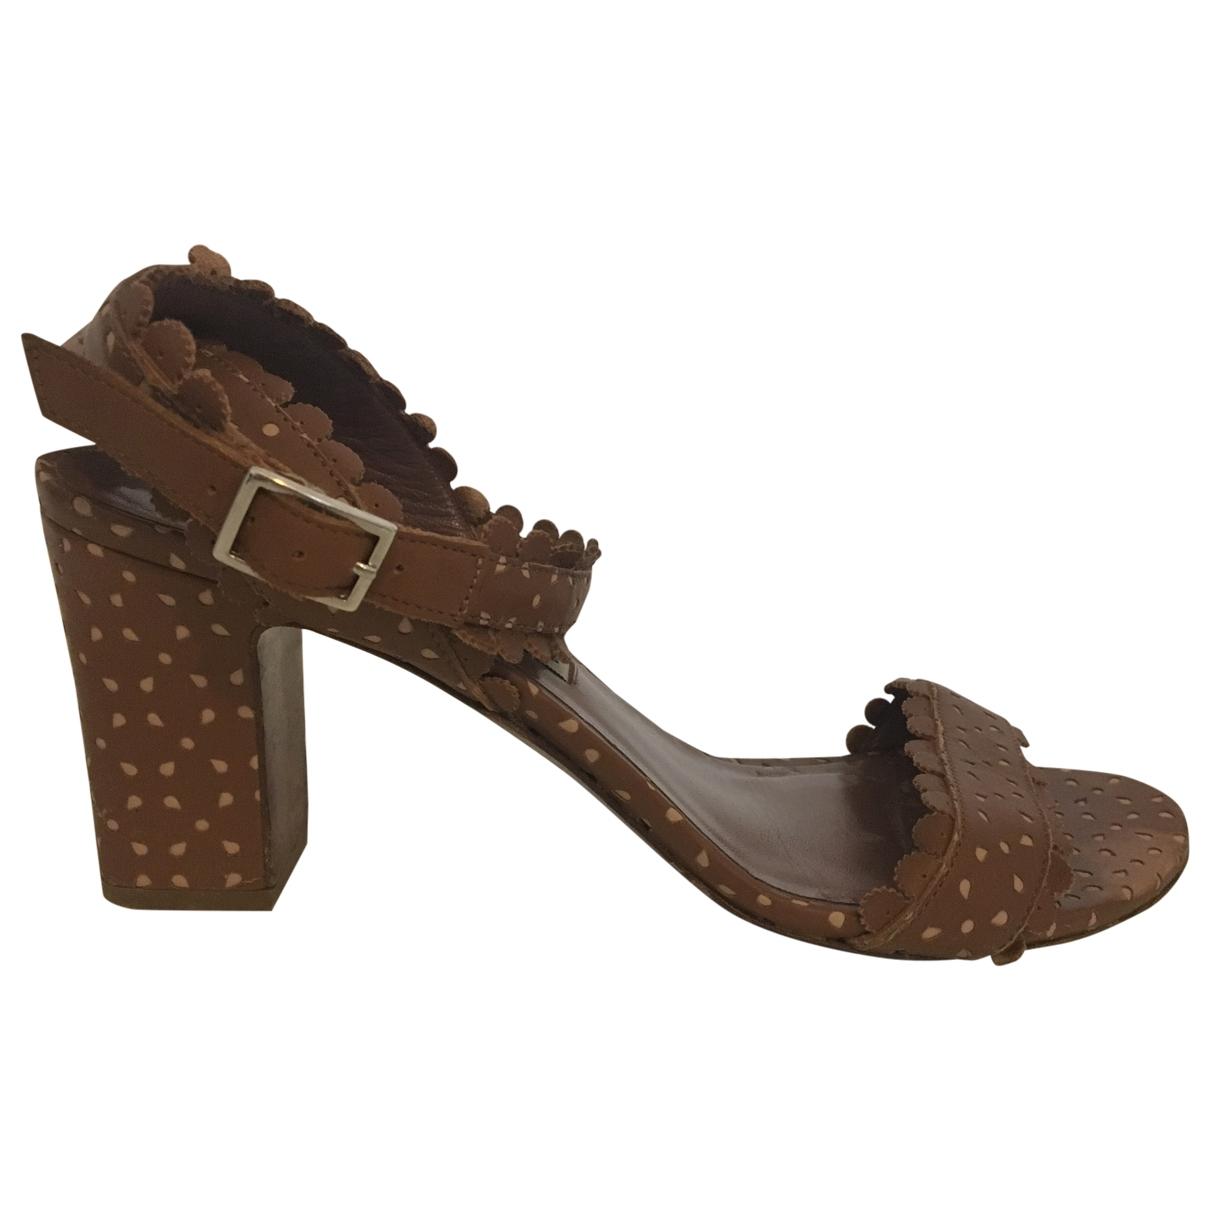 Tabitha Simmons \N Beige Leather Sandals for Women 38 EU